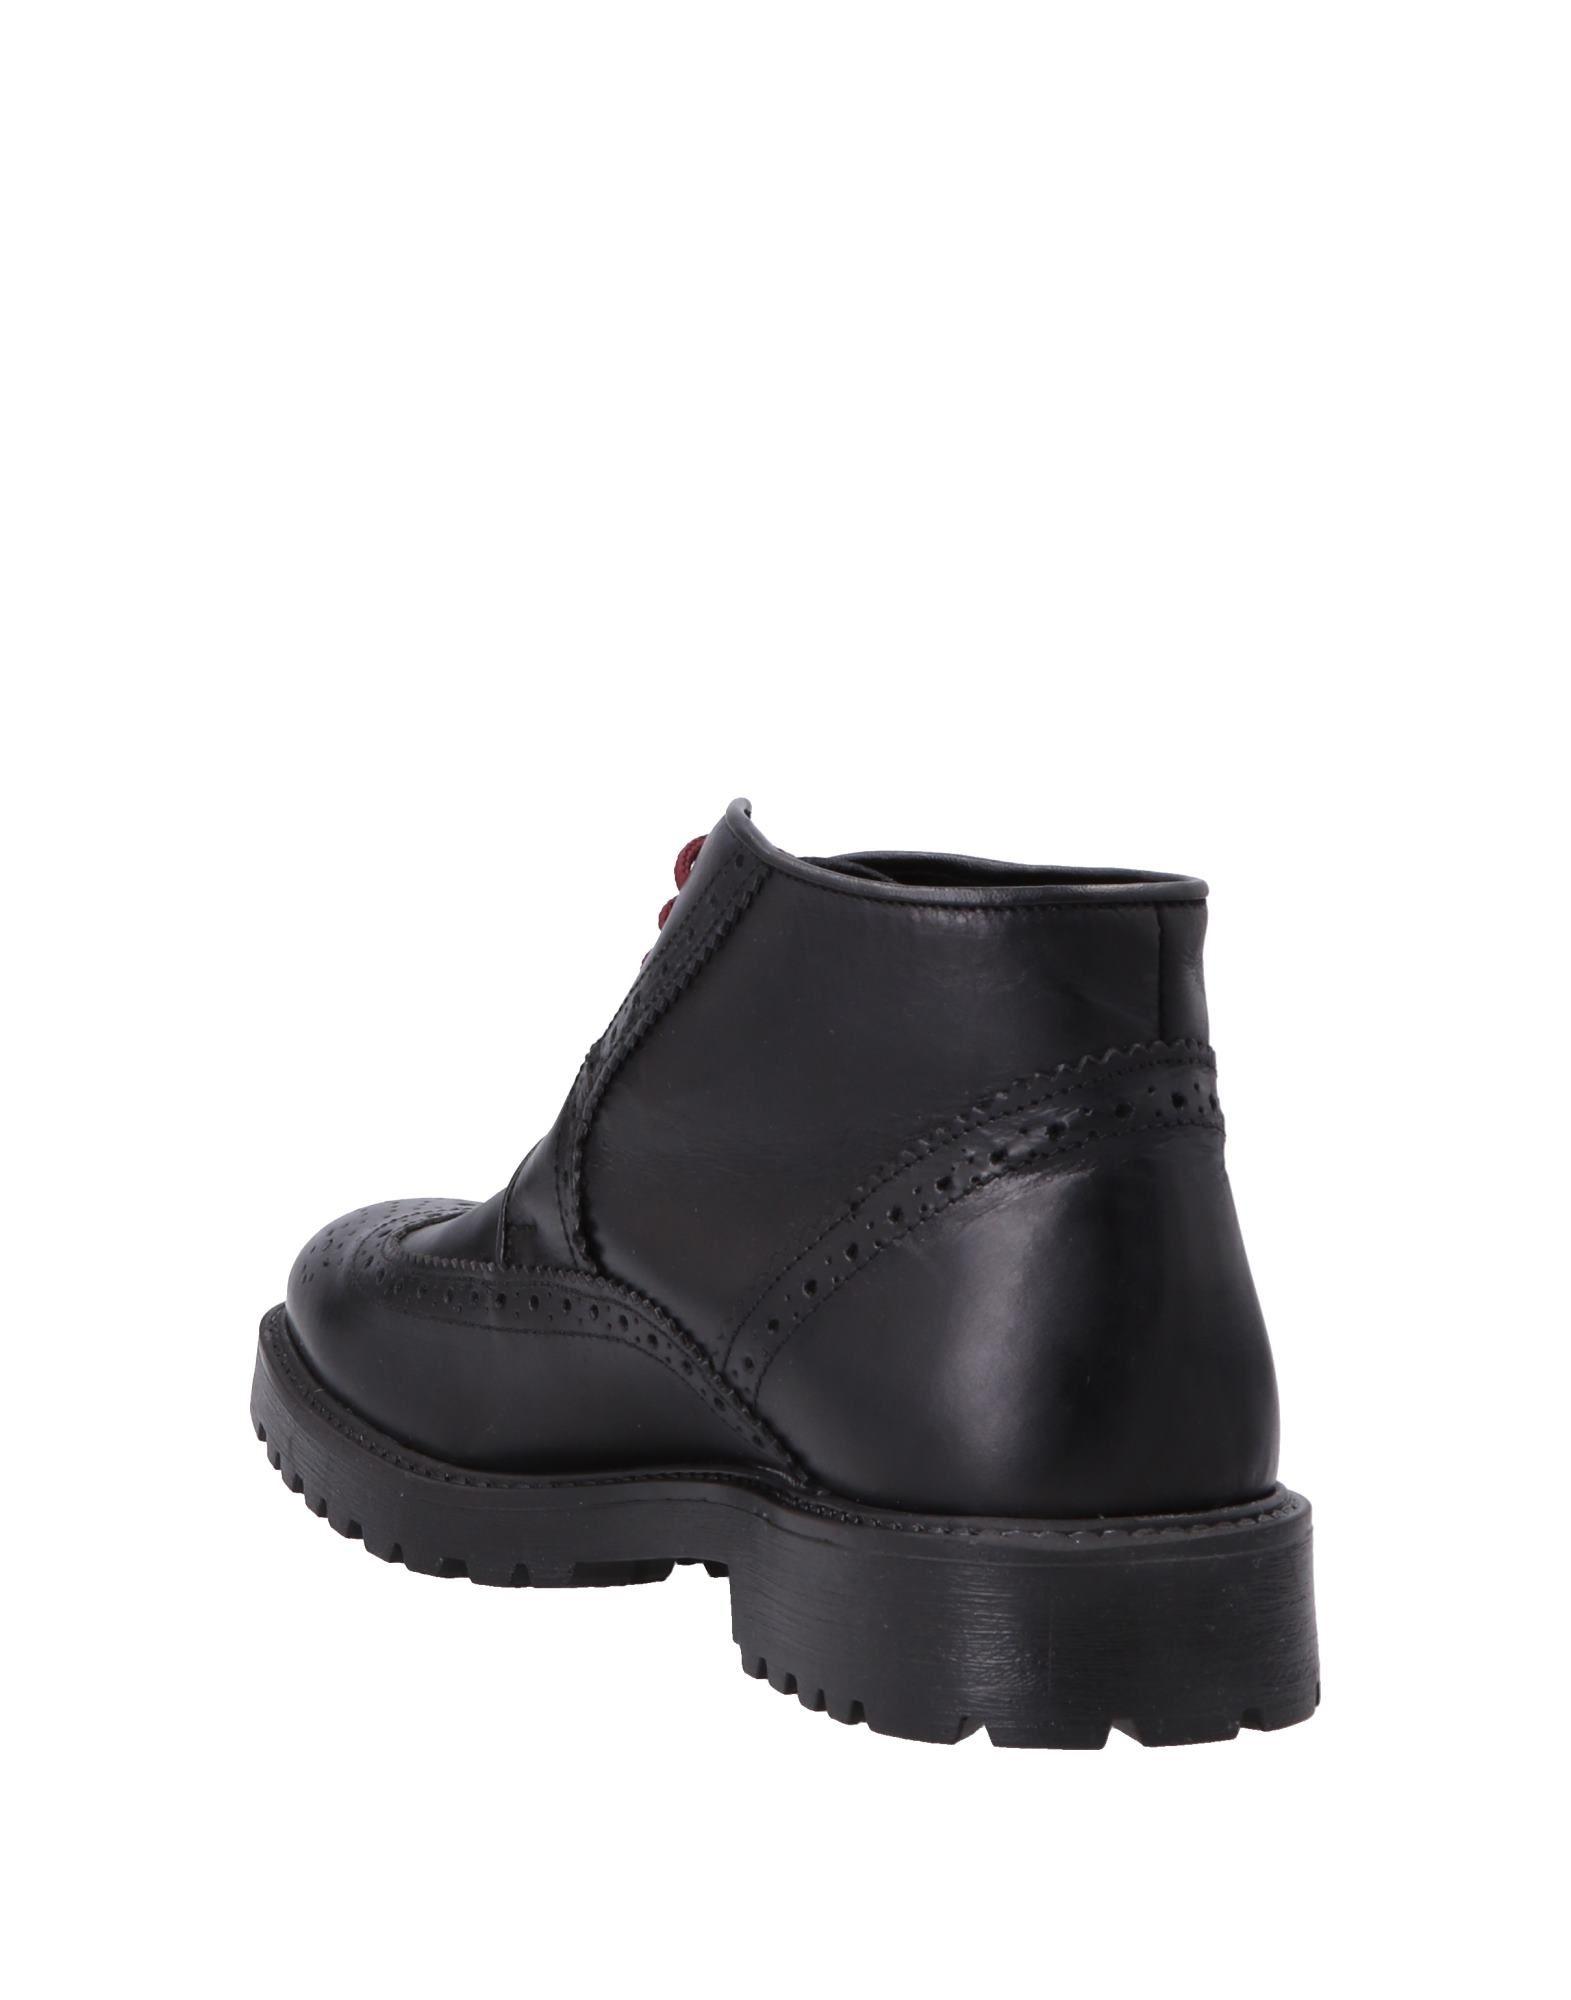 Rabatt Herren echte Schuhe P138 Stiefelette Herren Rabatt  11555188RV 41e2e9